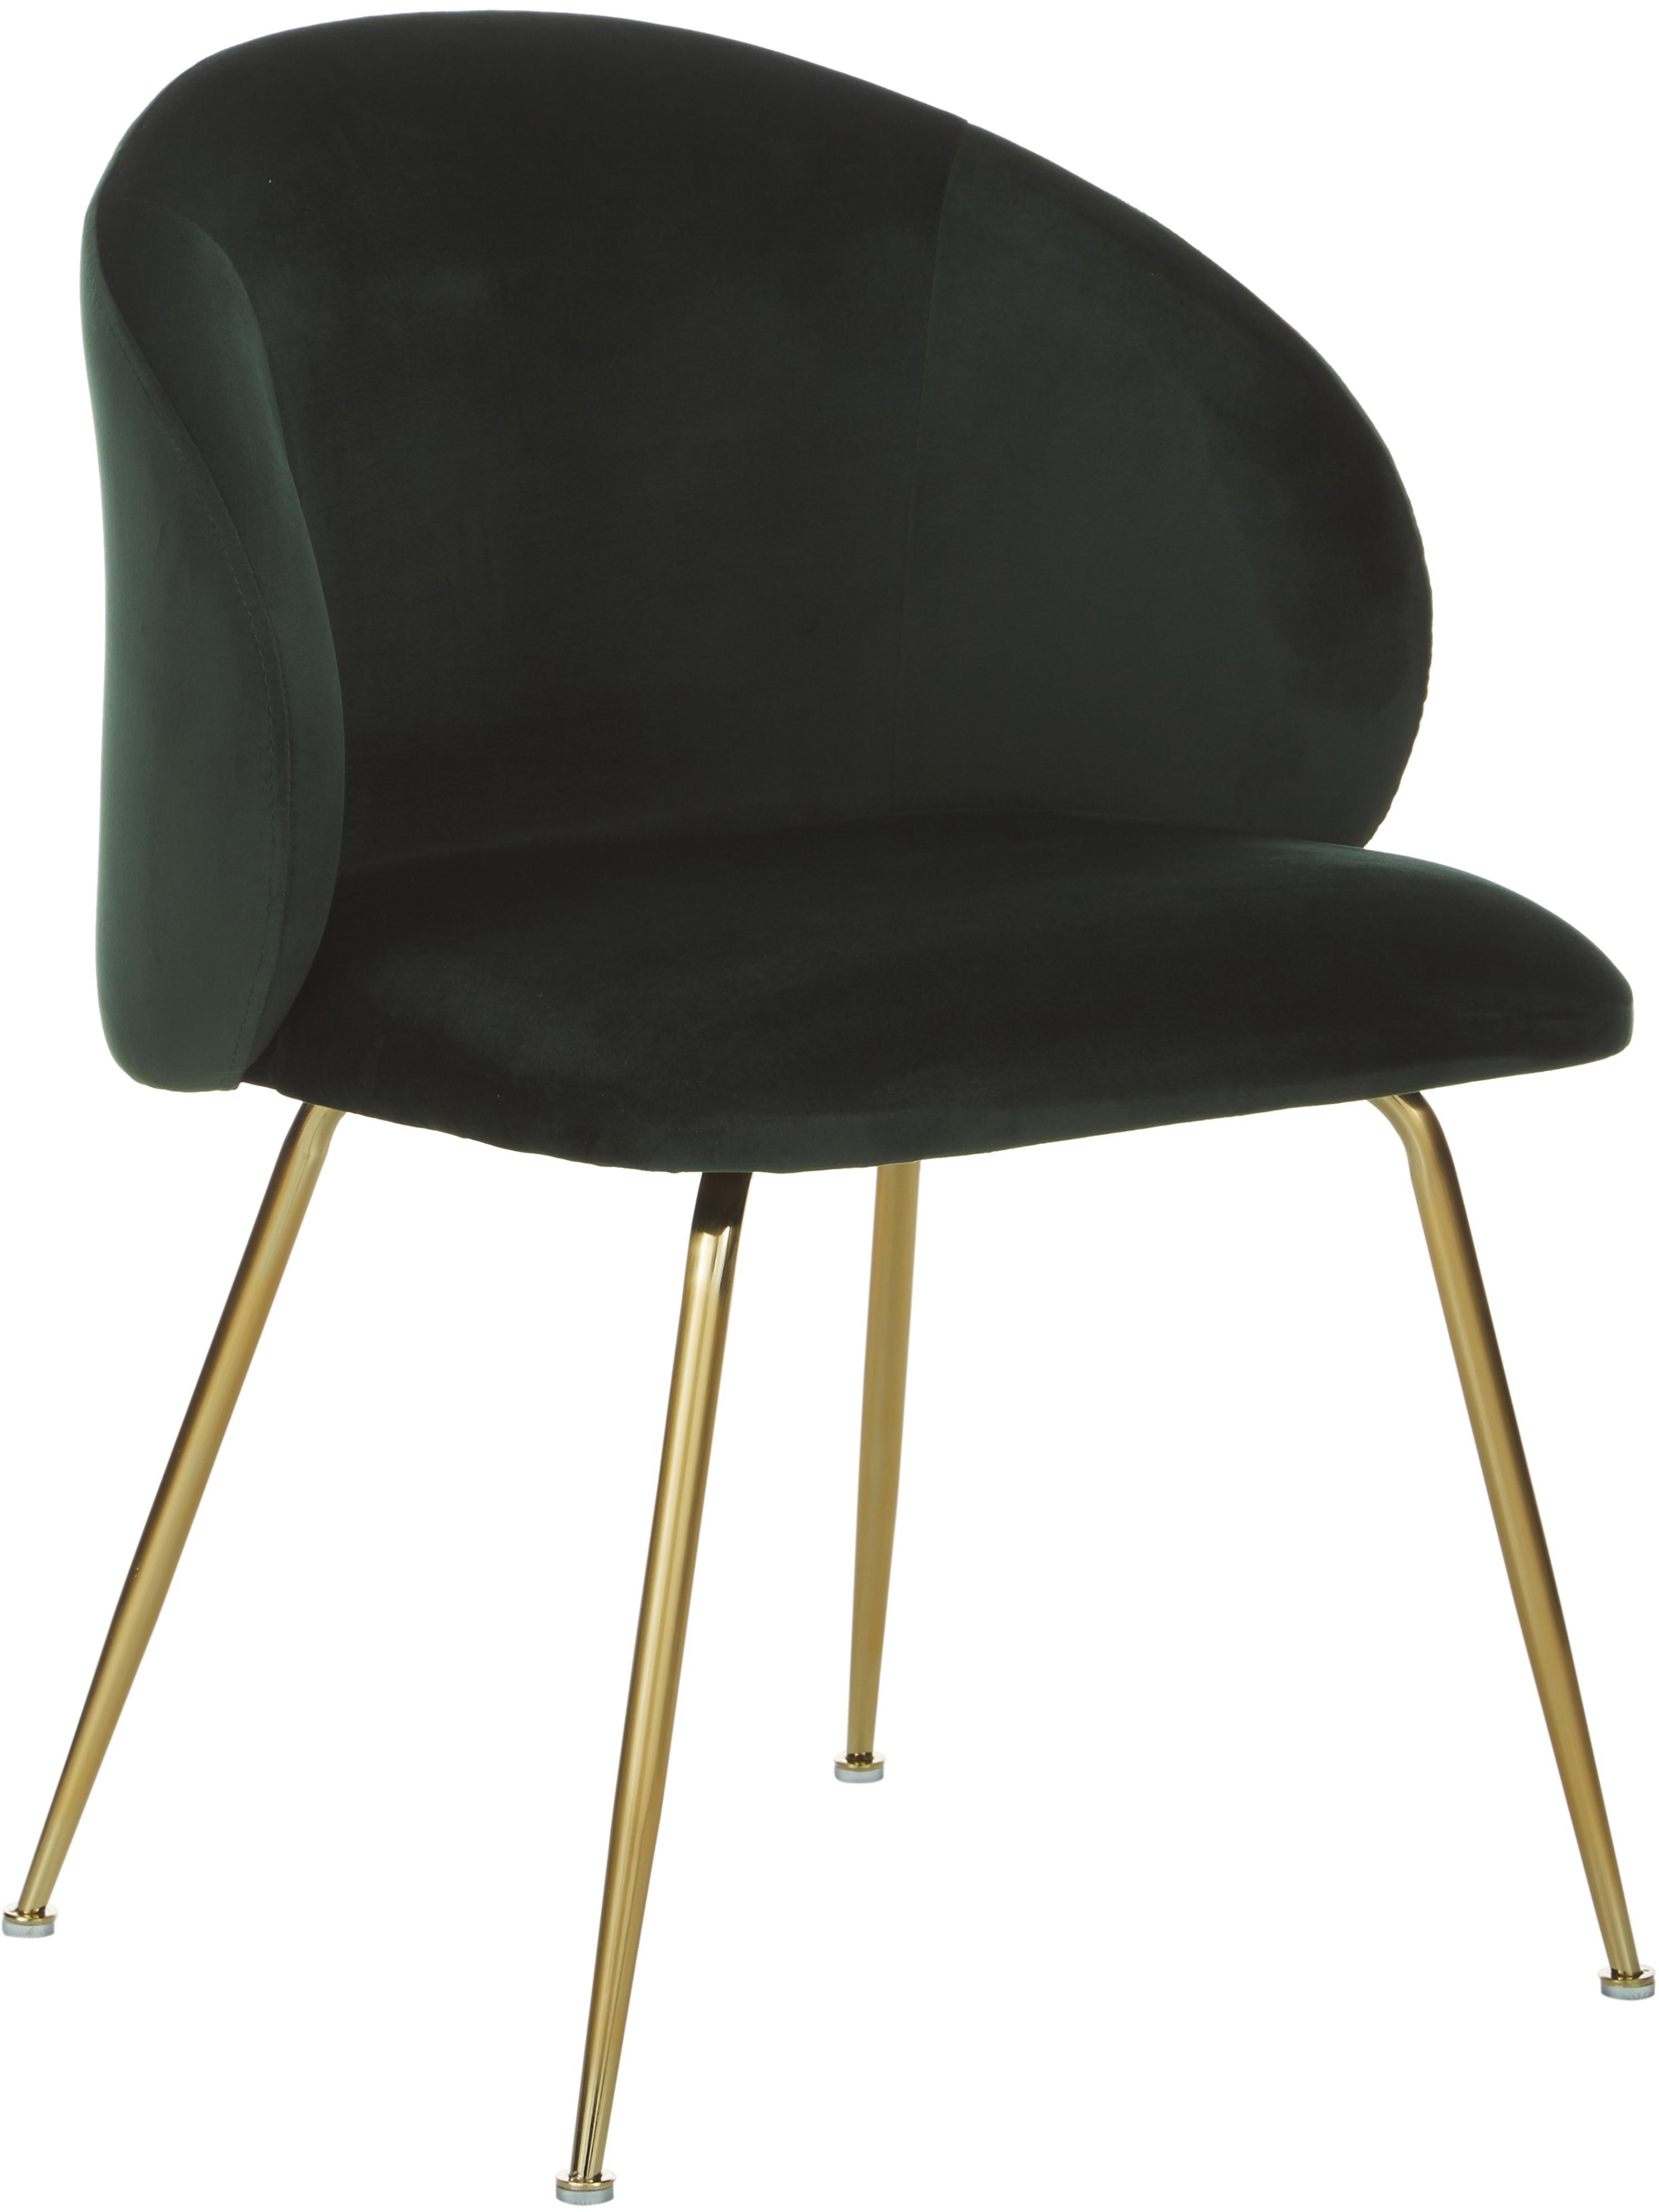 Sedia imbottita in velluto Luisa 2 pz, Rivestimento: velluto (100% poliestere), Gambe: metallo verniciato, Velluto verde scuro, oro, Larg. 61 x Prof. 58 cm